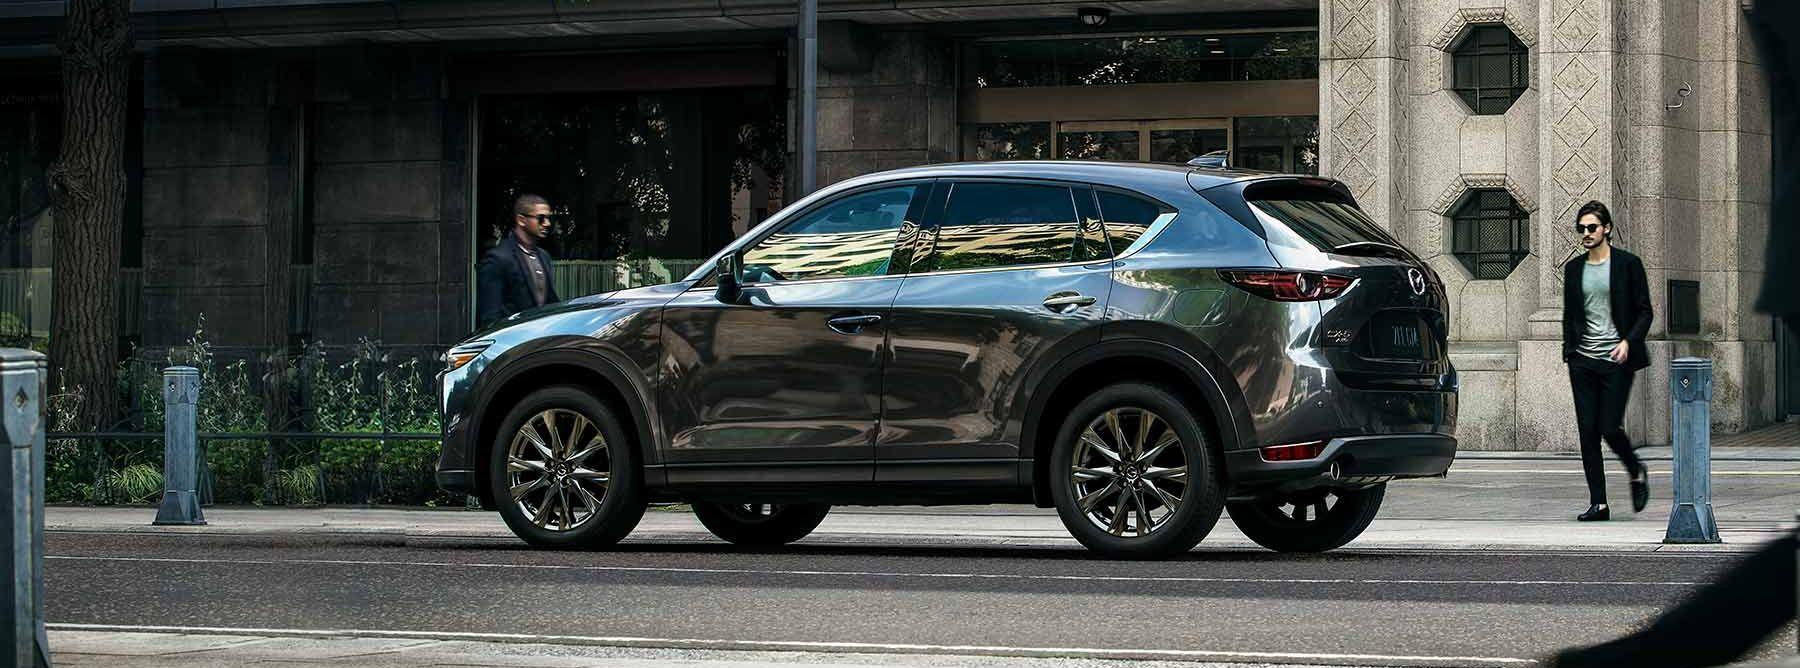 2019 Mazda CX-5 Financing near Fullerton, CA